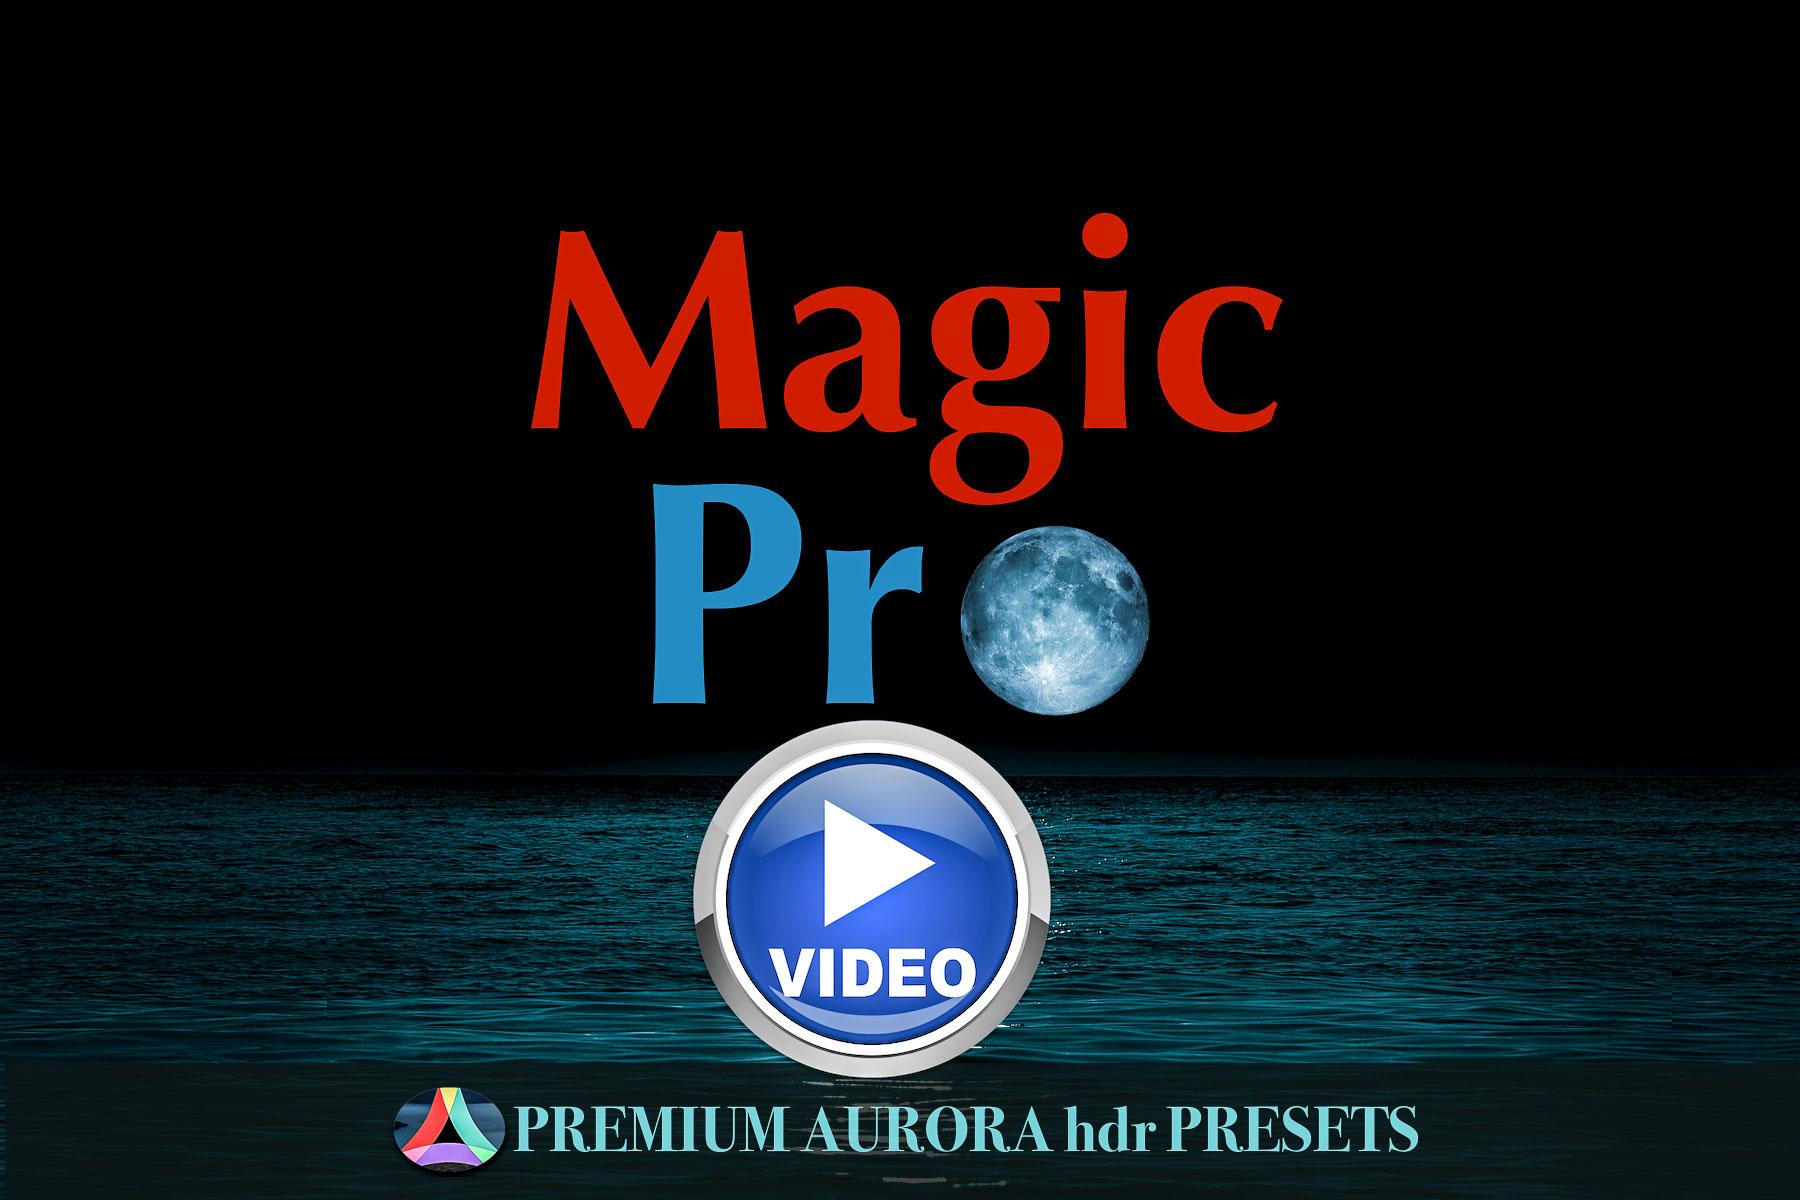 Presenting new premium and free Aurora hdr 2019 looks from PixaFOTO.com